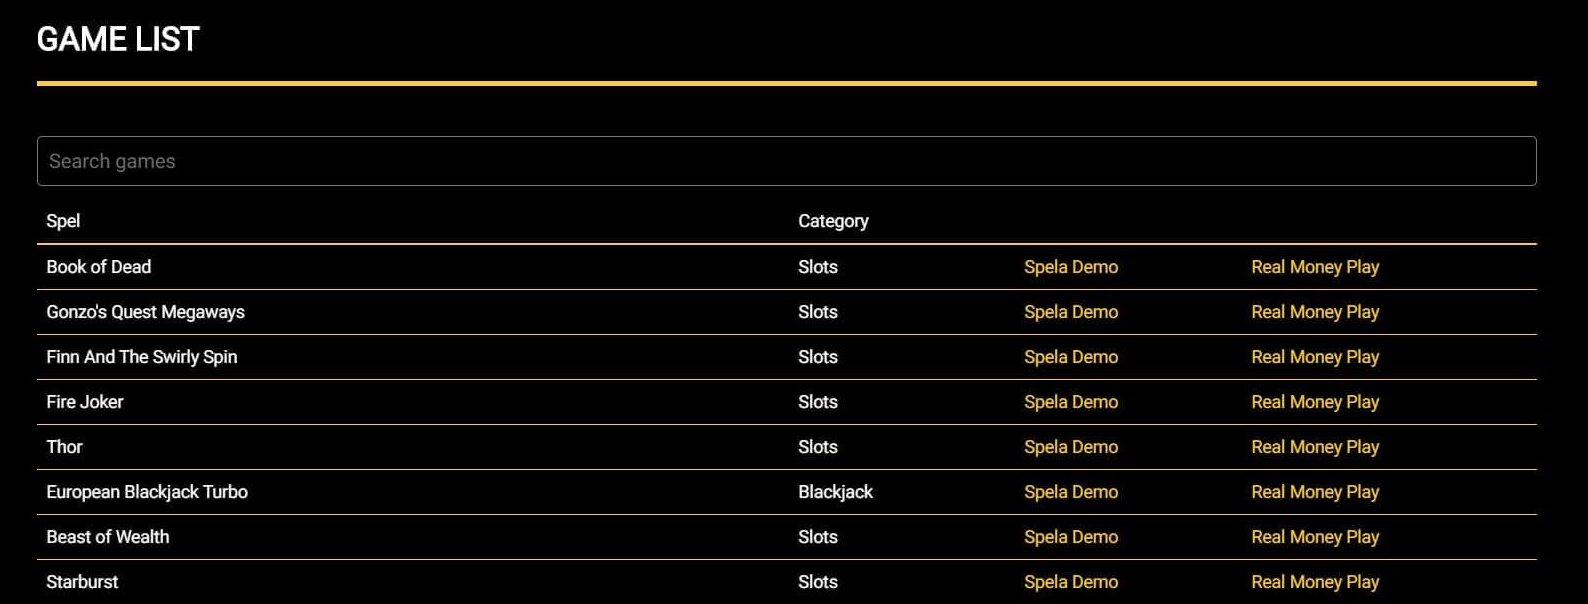 Mega Casino har en unik Game List